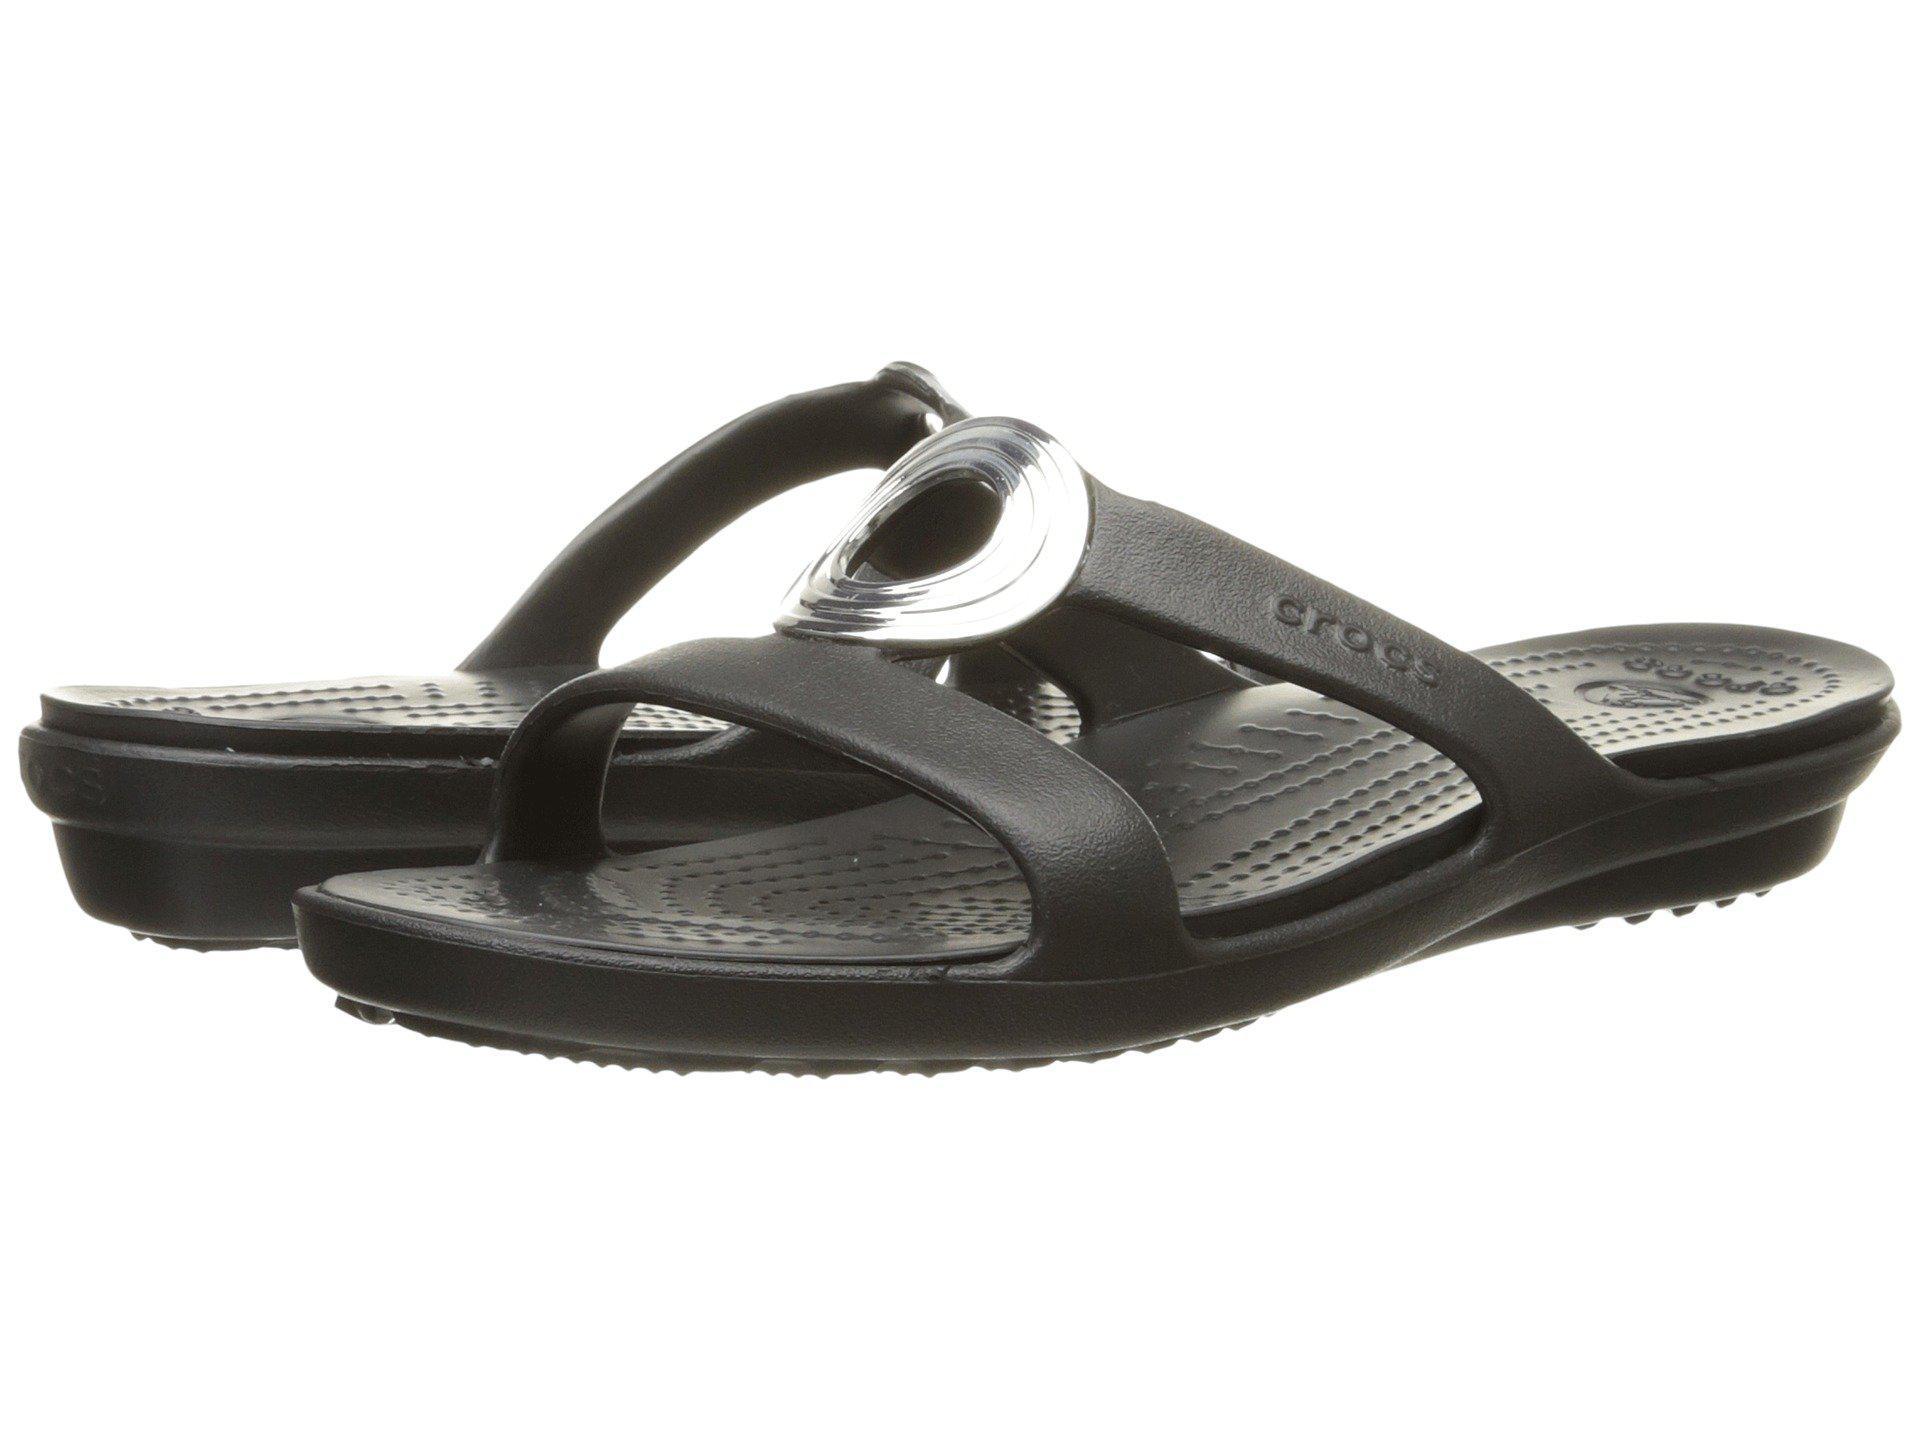 25e9c275daea Lyst - Crocs™ Sanrah Beveled Circle Sandal in Black